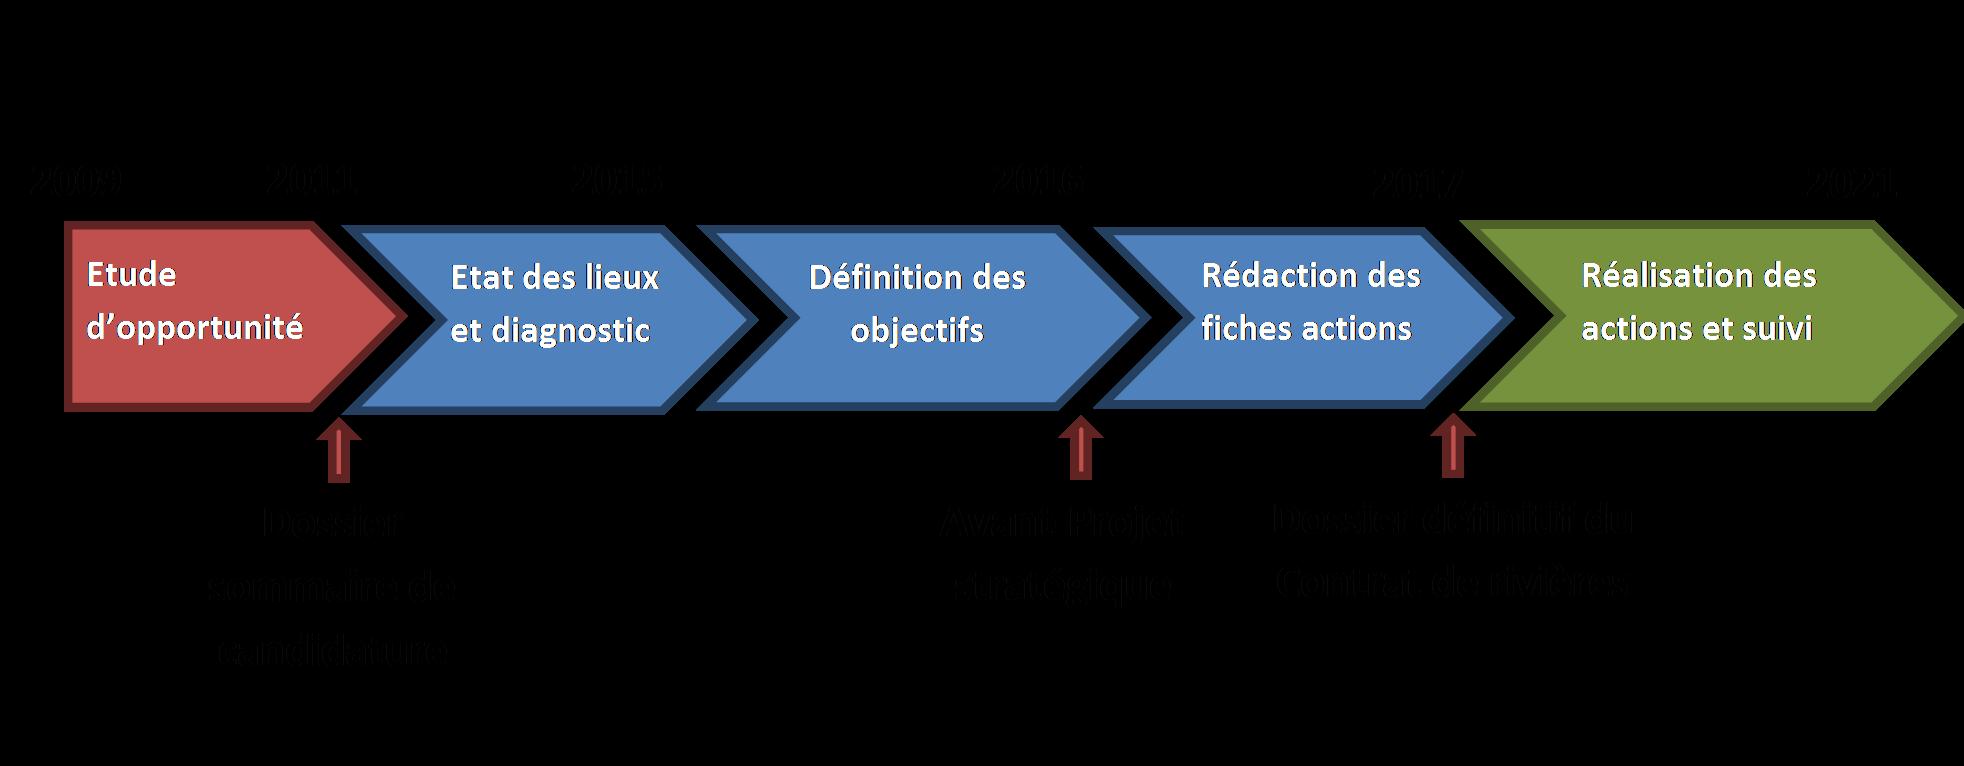 calendrier-d-elaboration-du-contrat-de-rivieres-paladru-fure-morge-olon